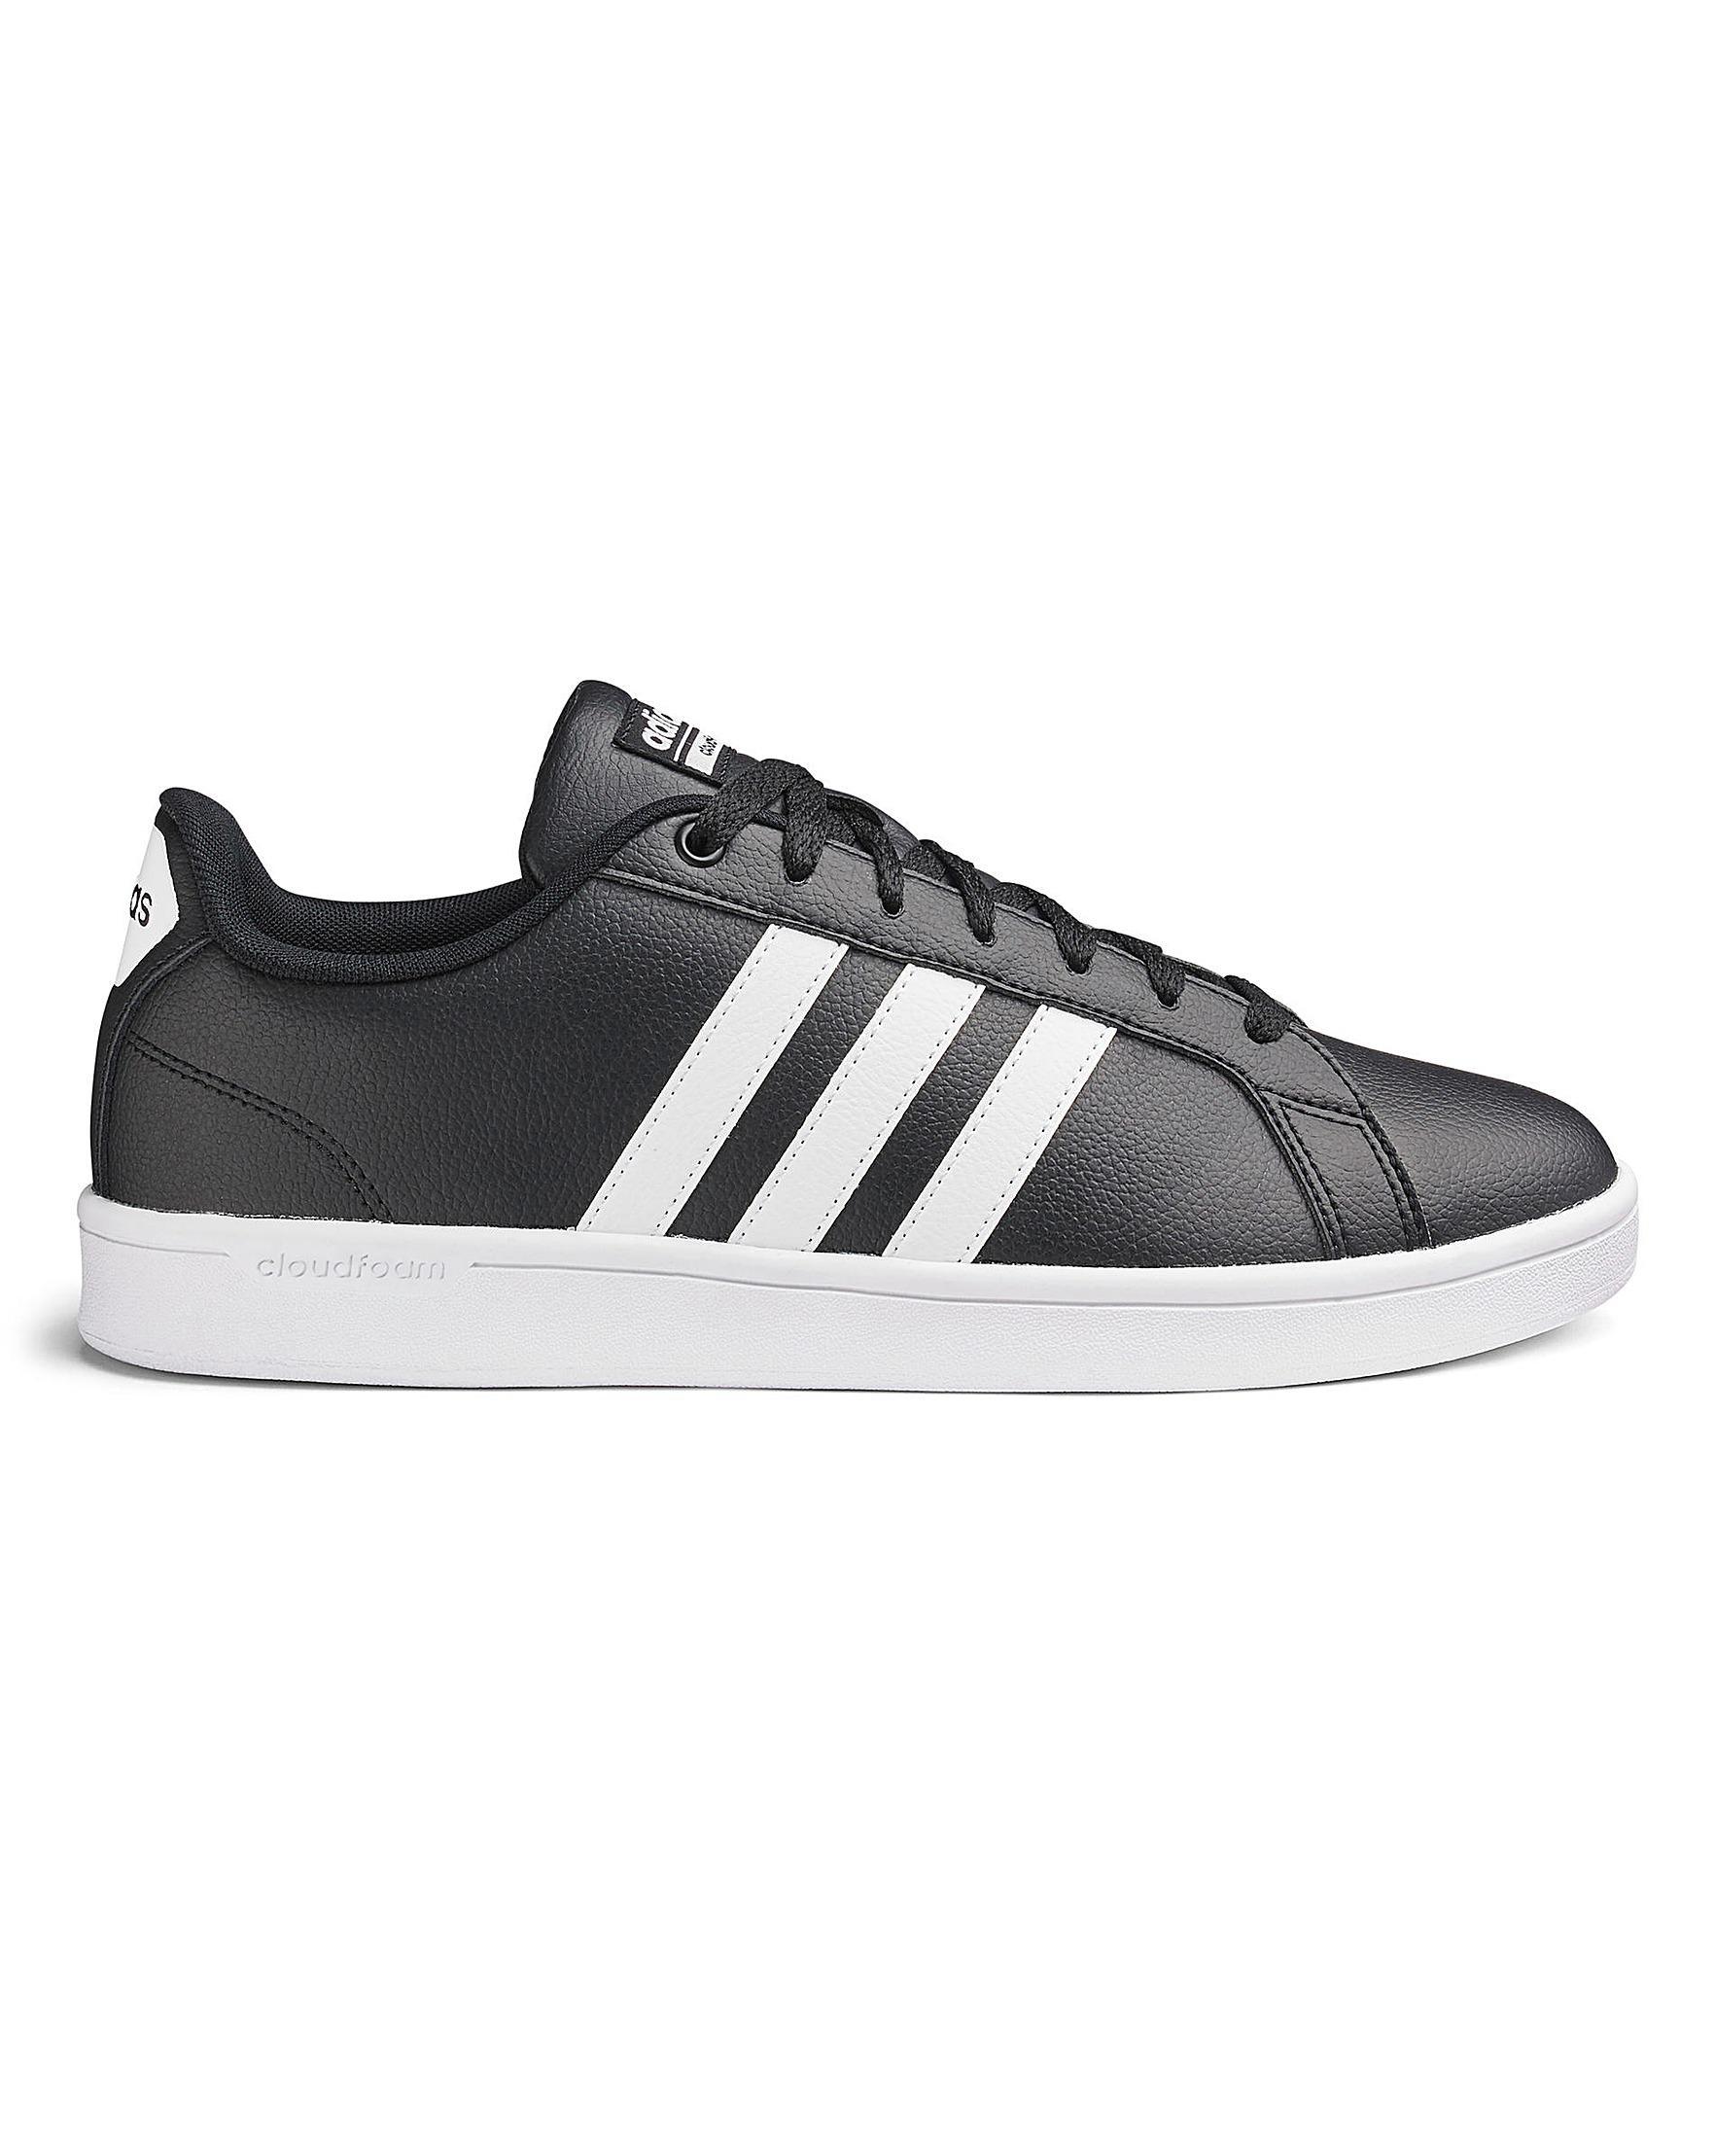 Adidas Cloudfoam Advantage Trainers in Black for Men - Lyst 165c0702d